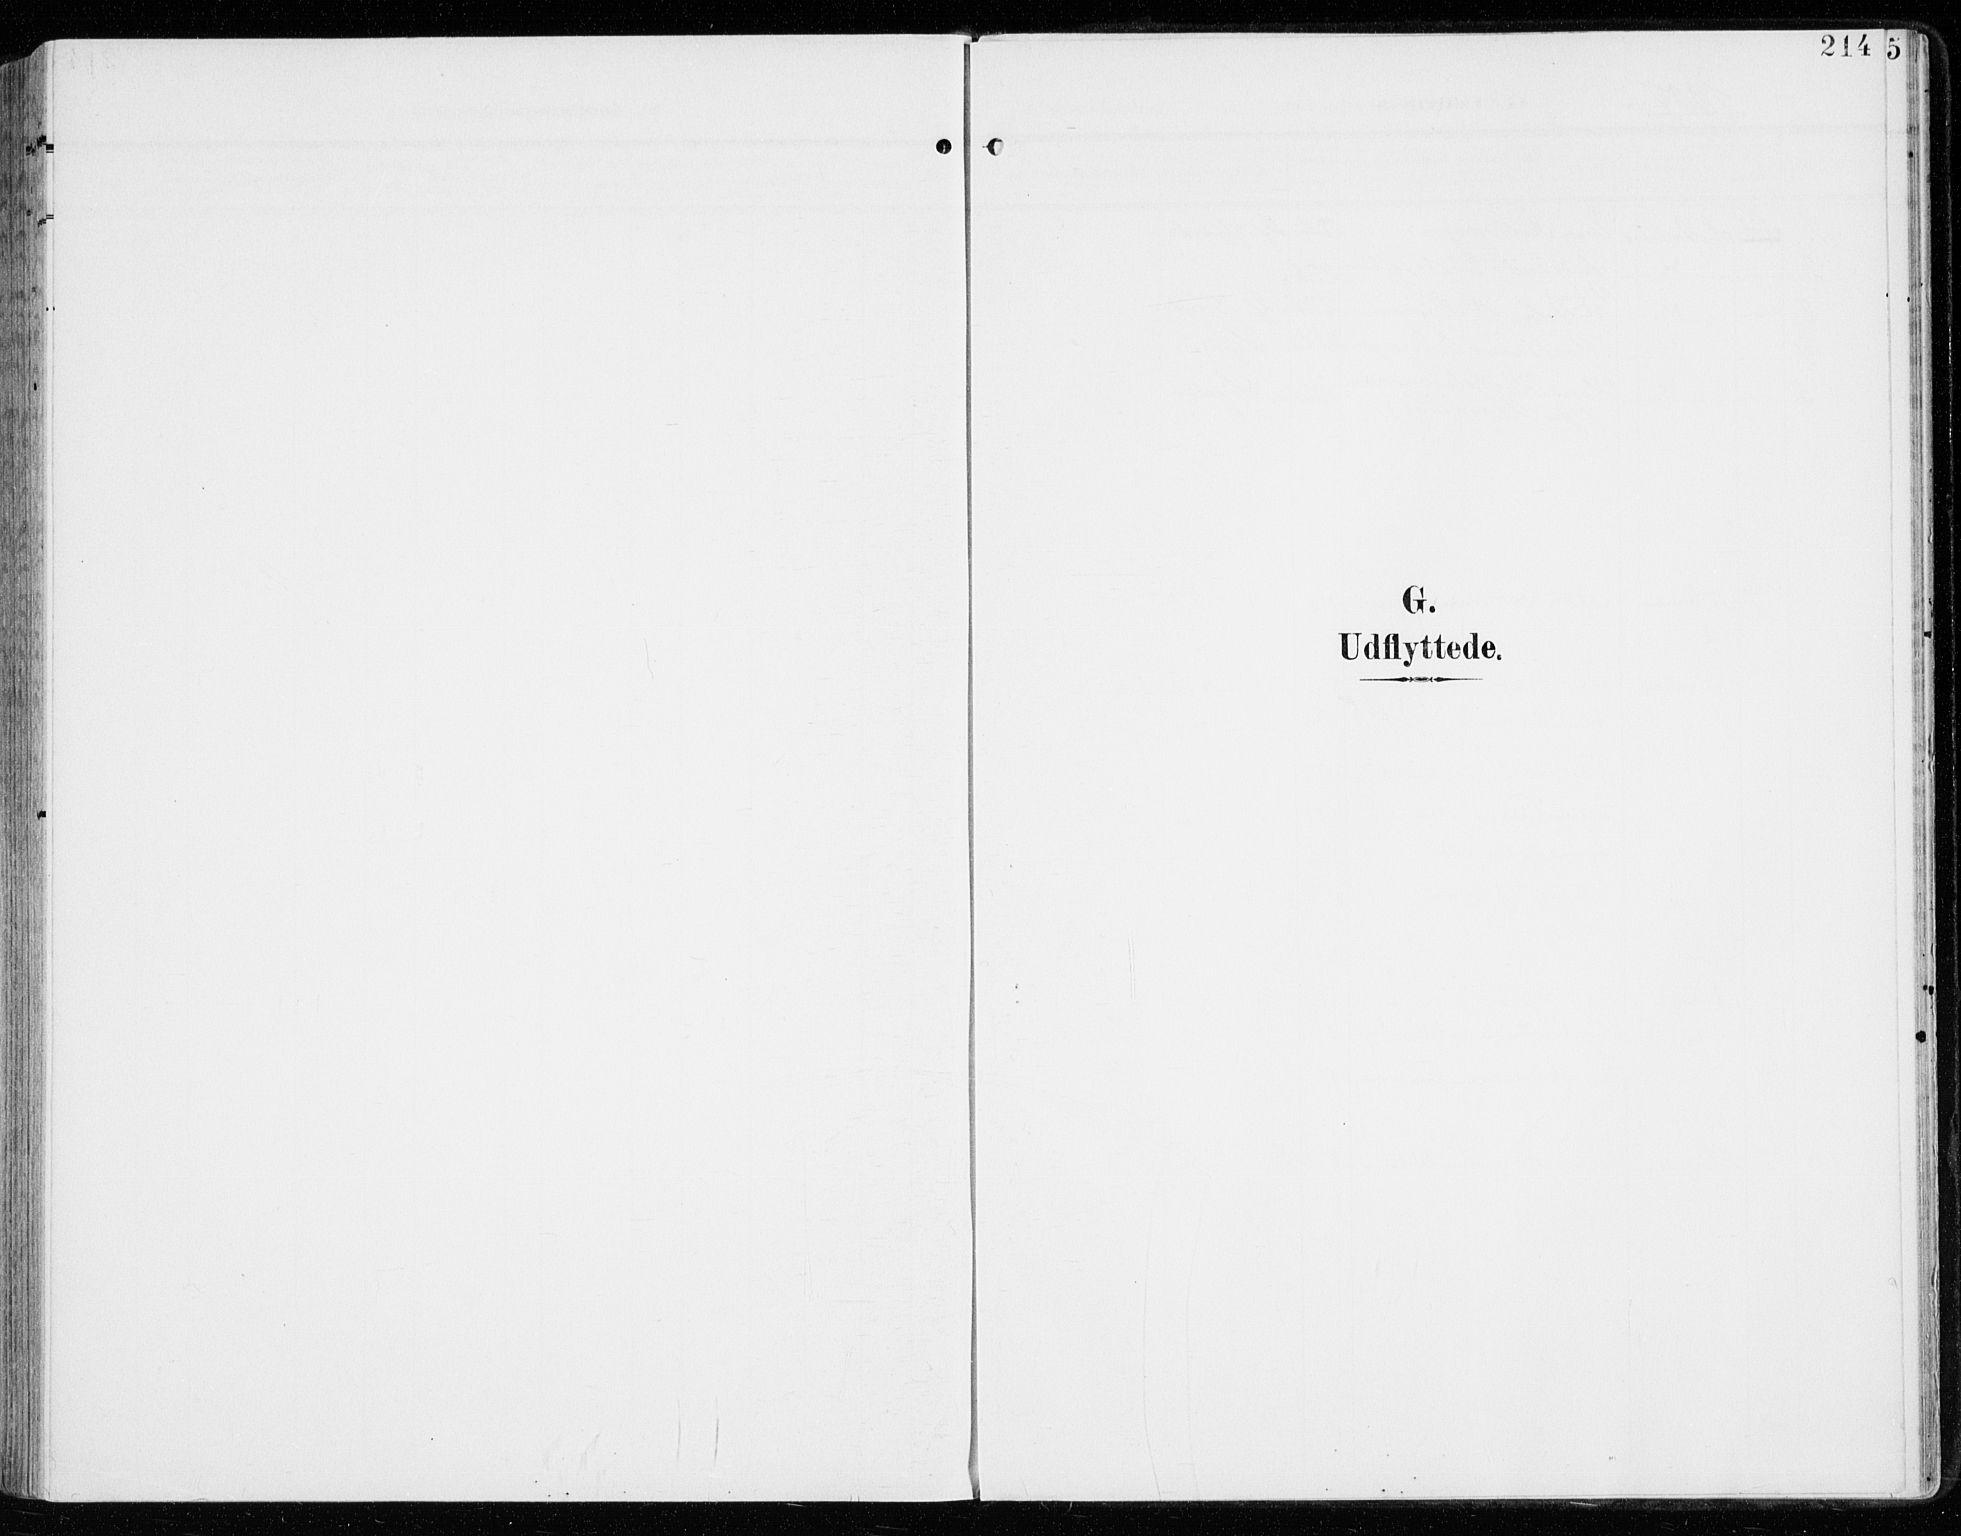 SAH, Vardal prestekontor, H/Ha/Haa/L0016: Ministerialbok nr. 16, 1904-1916, s. 214